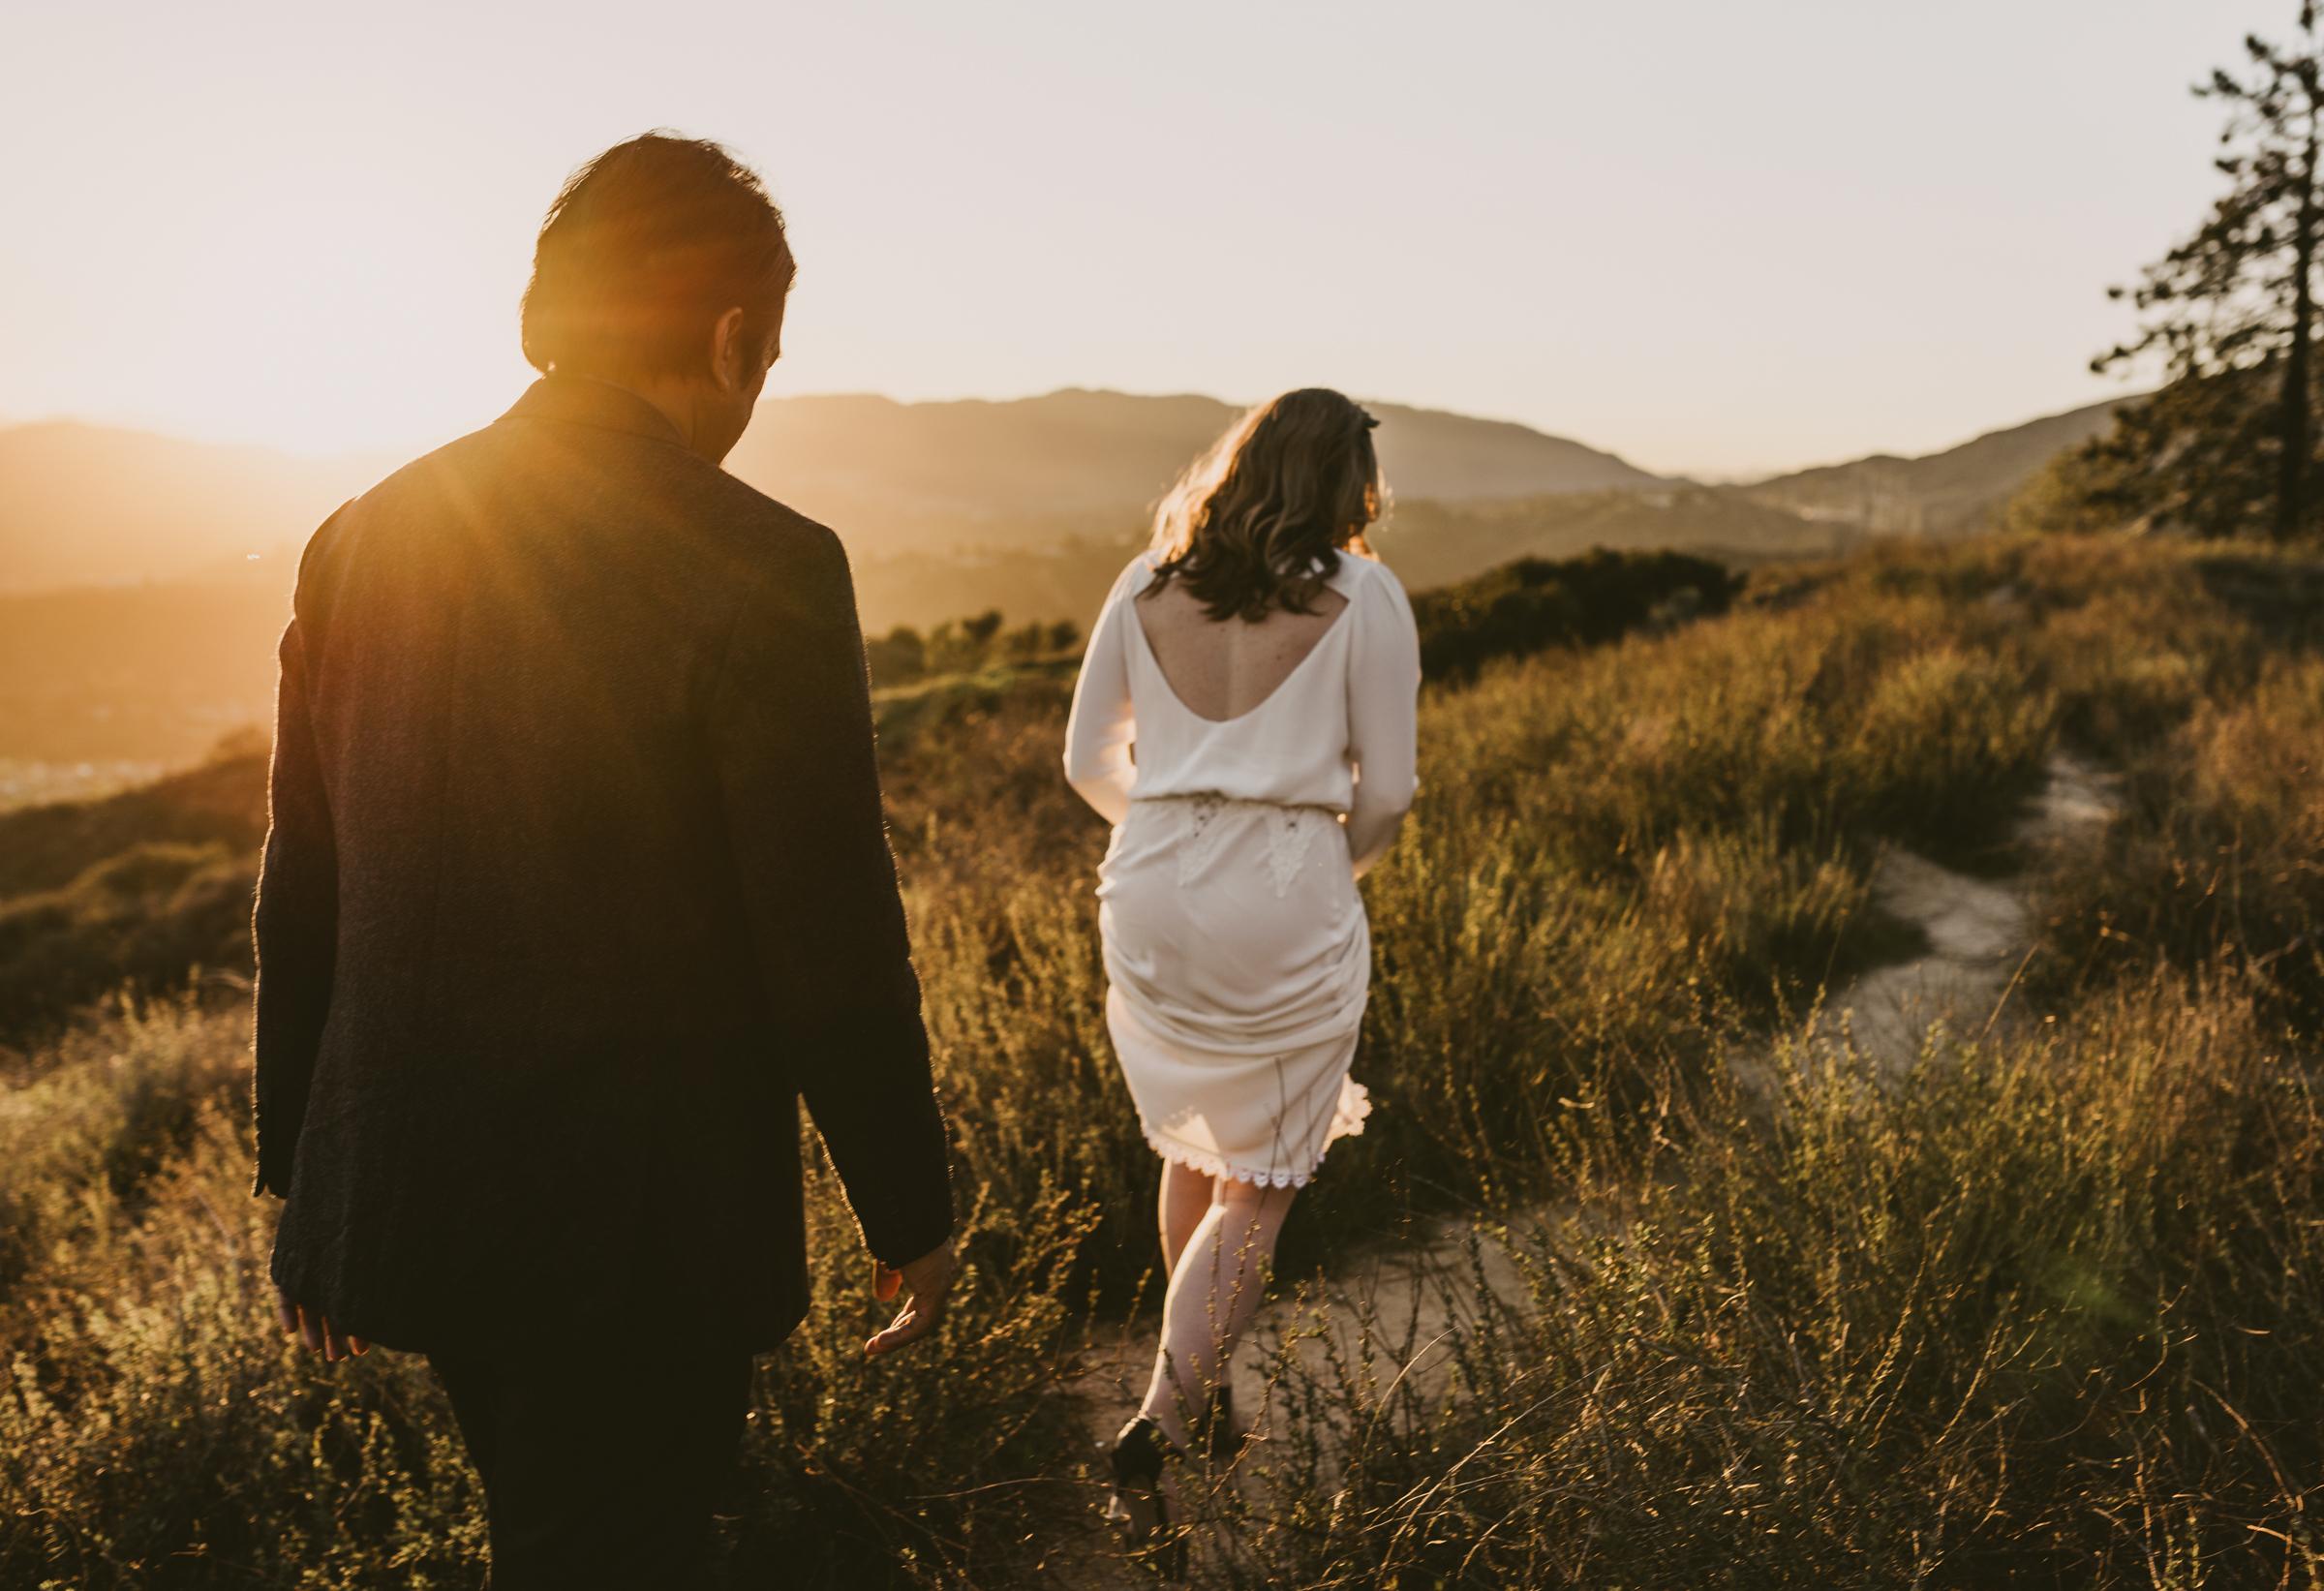 ©Isaiah + Taylor Photography - Intimate Elopement, Eaton Canyon, Los Angeles Wedding Photographer-83.jpg